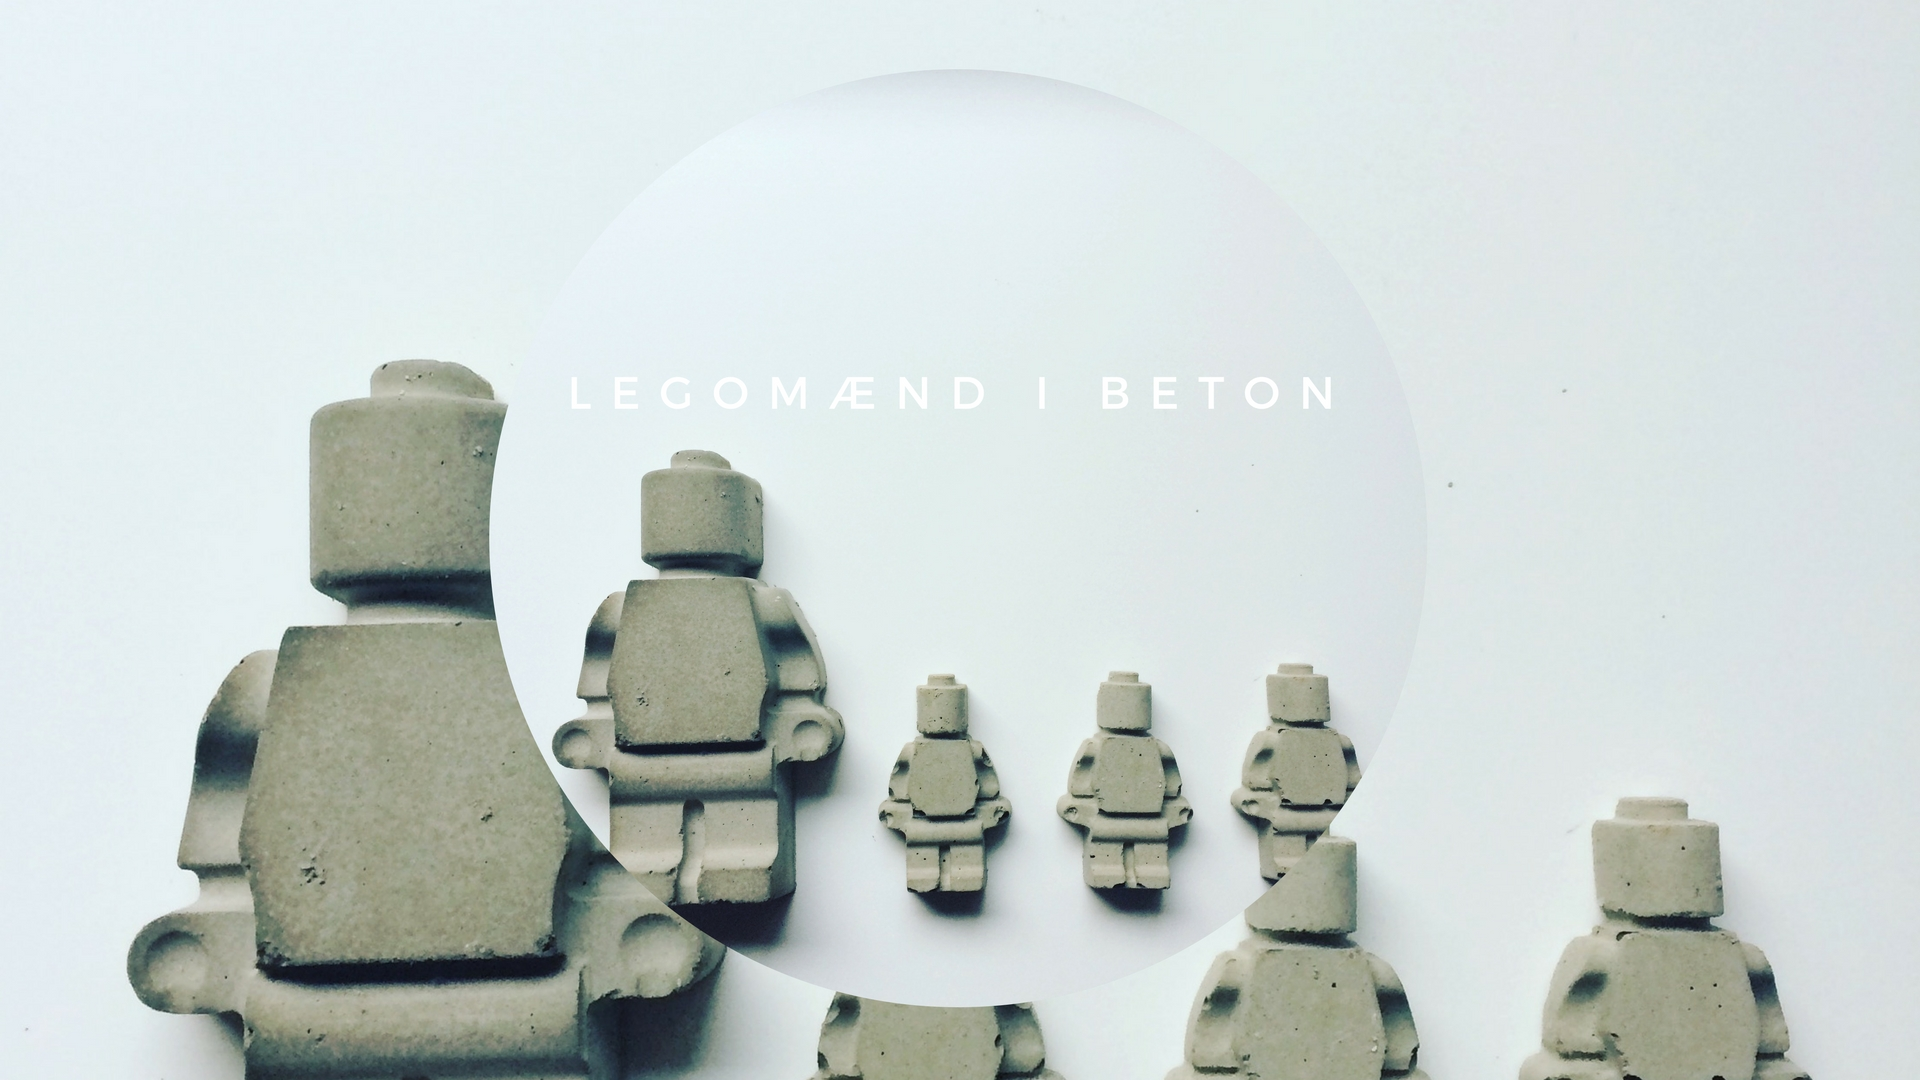 Legomænd-i-beton.jpg